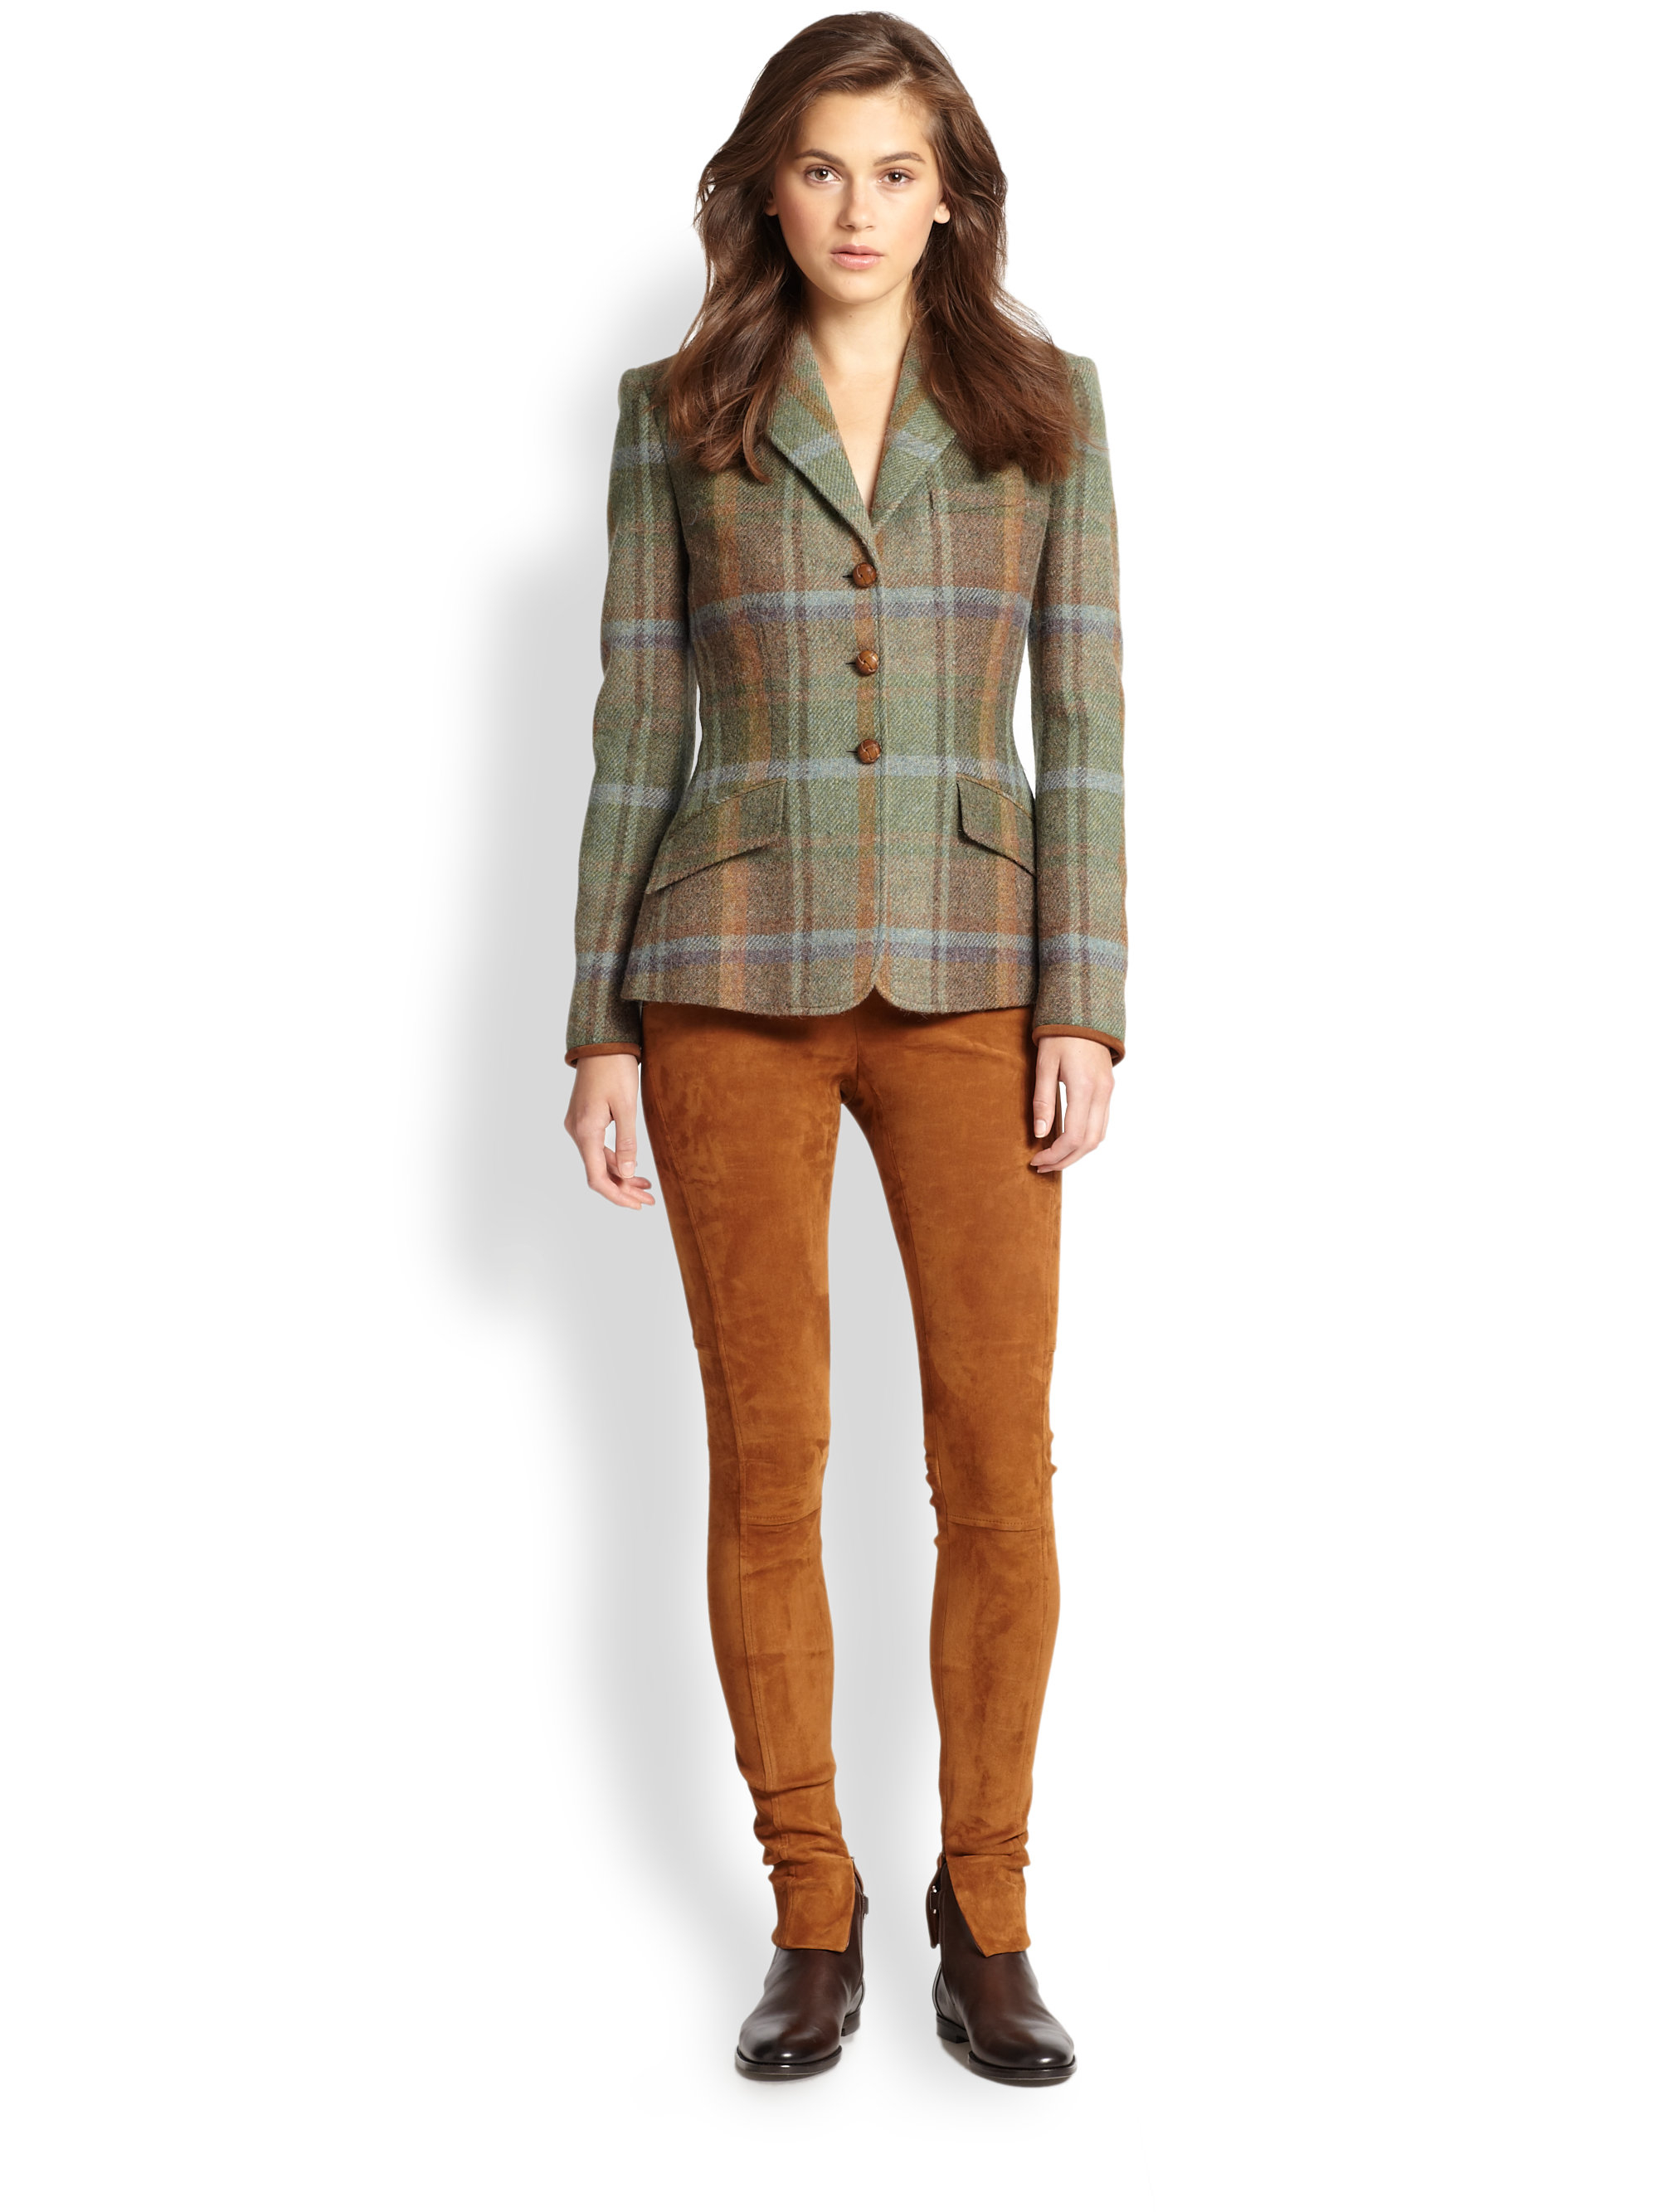 Ralph Lauren Blue Label Custom Riding Jacket Lyst